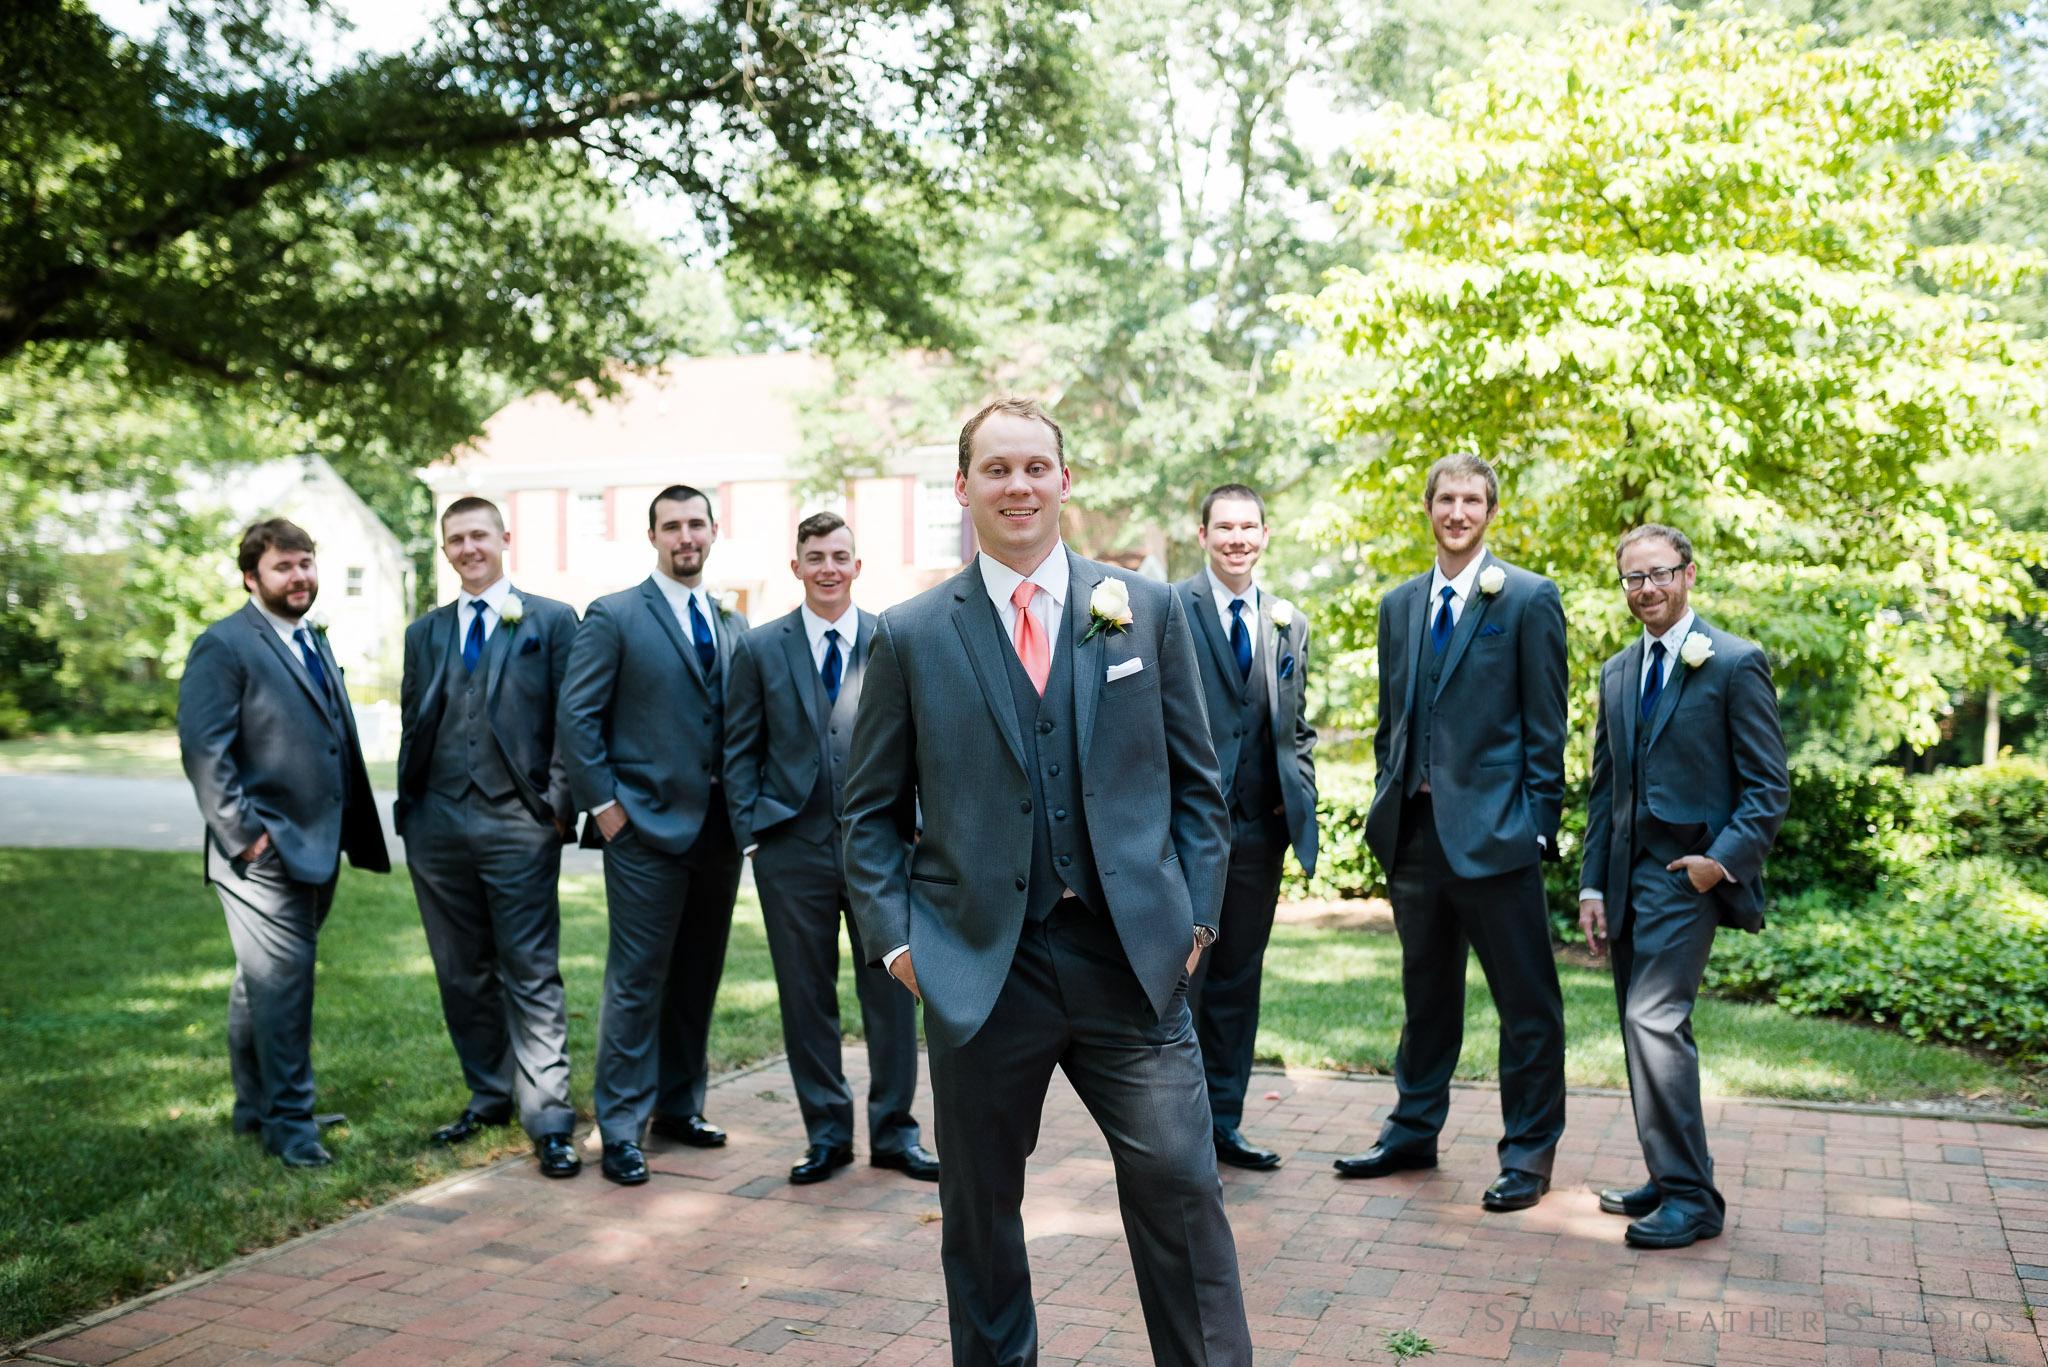 market-hall-wedding-raleigh-021.jpg